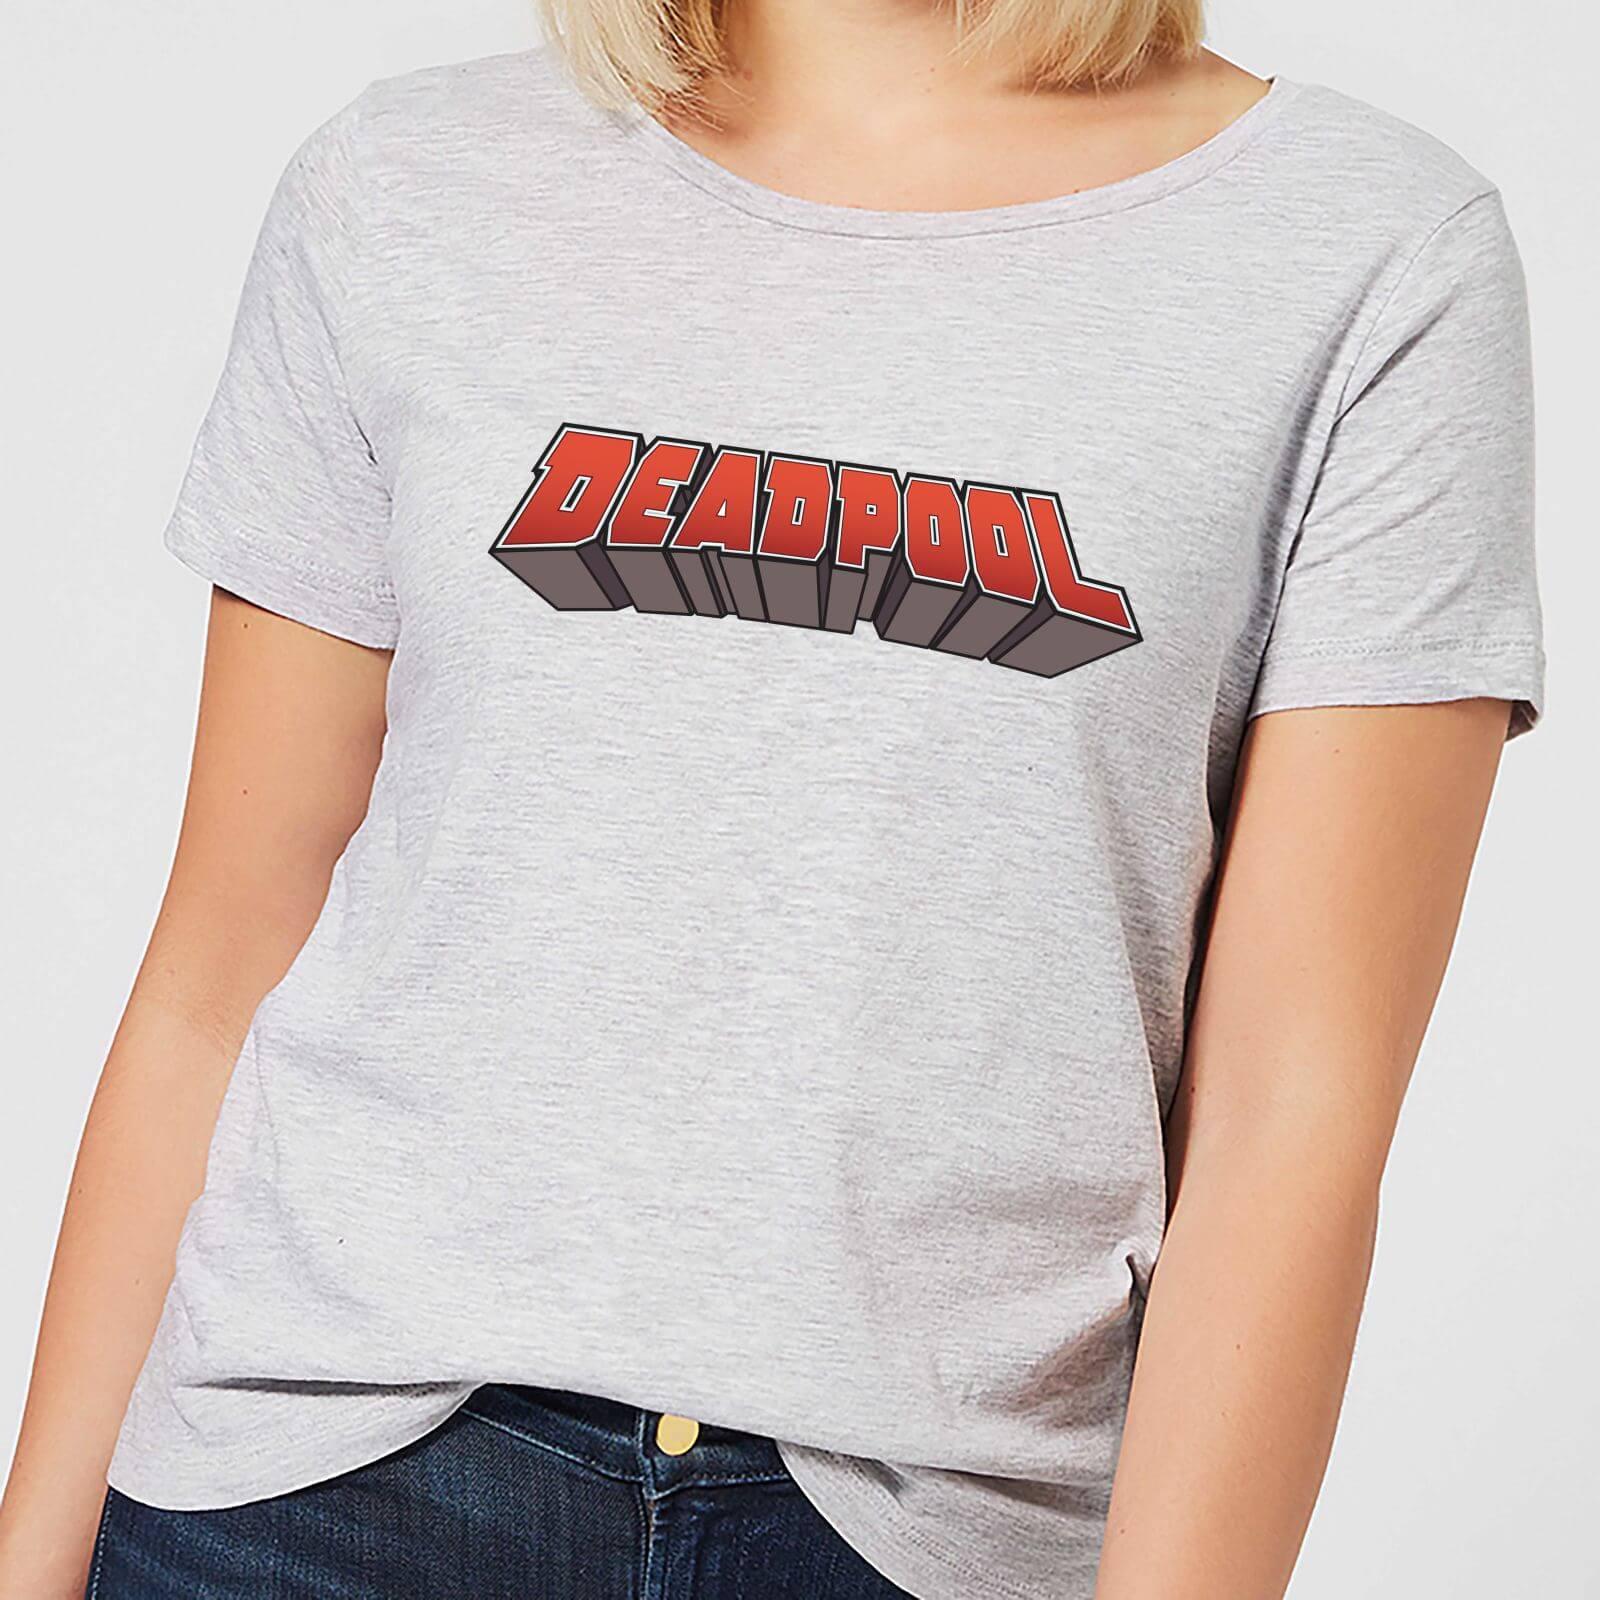 OfferteWeb.click 75-t-shirt-marvel-deadpool-logo-grigio-donna-l-grigio